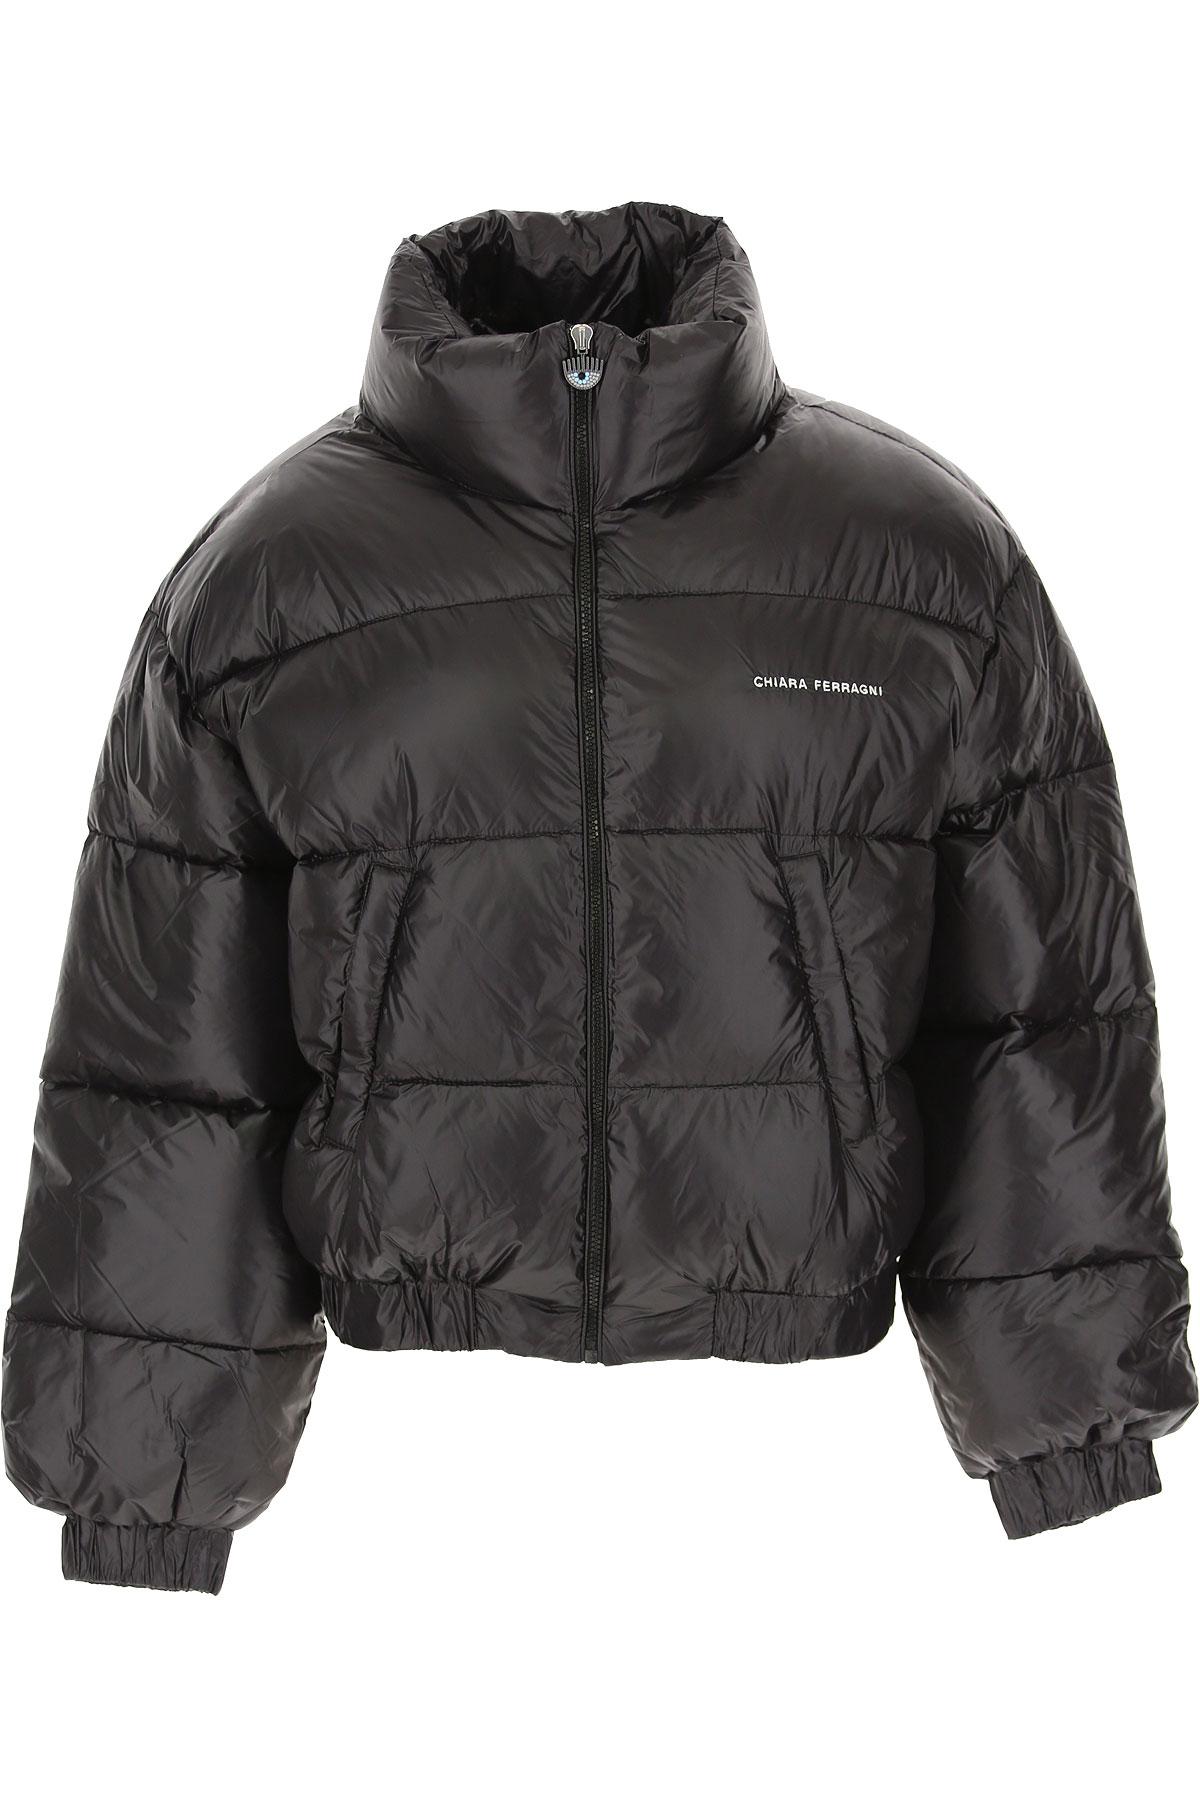 Chiara Ferragni Down Jacket for Women, Puffer Ski Jacket On Sale, Black, Down, 2019, 2 4